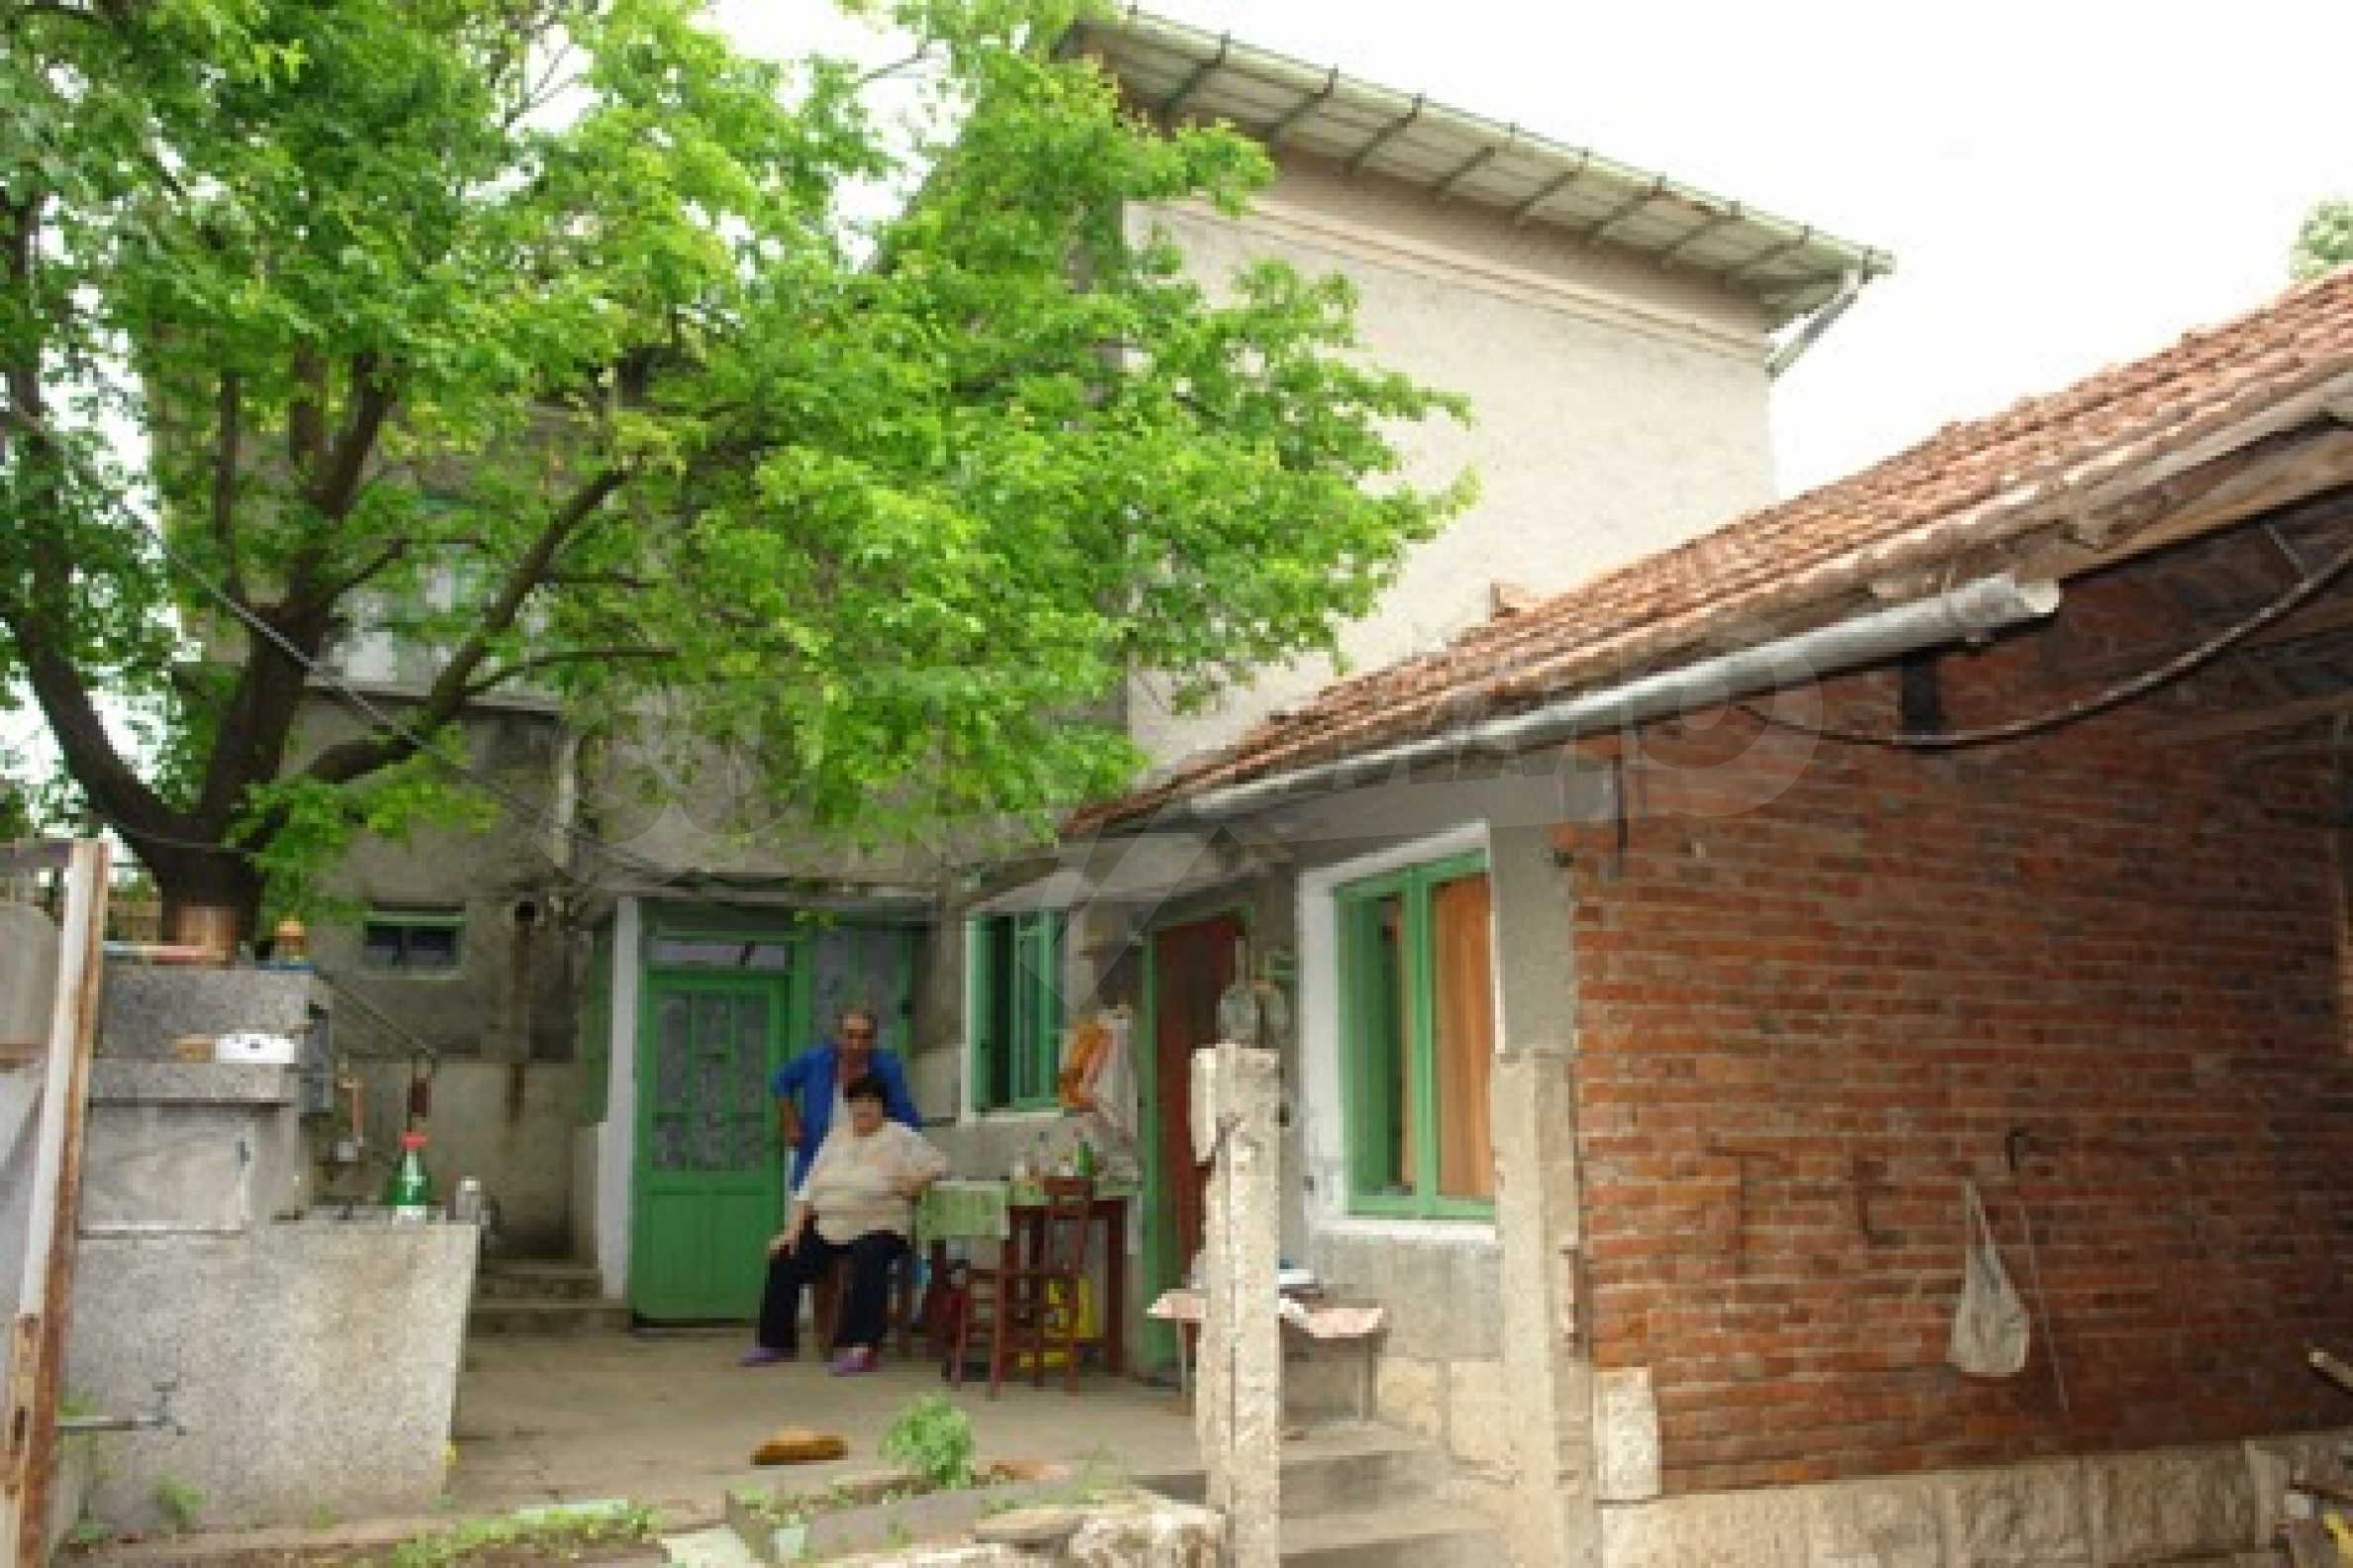 Spacious two-storey 4-bedroom house in Trastenik village, Ruse district 14